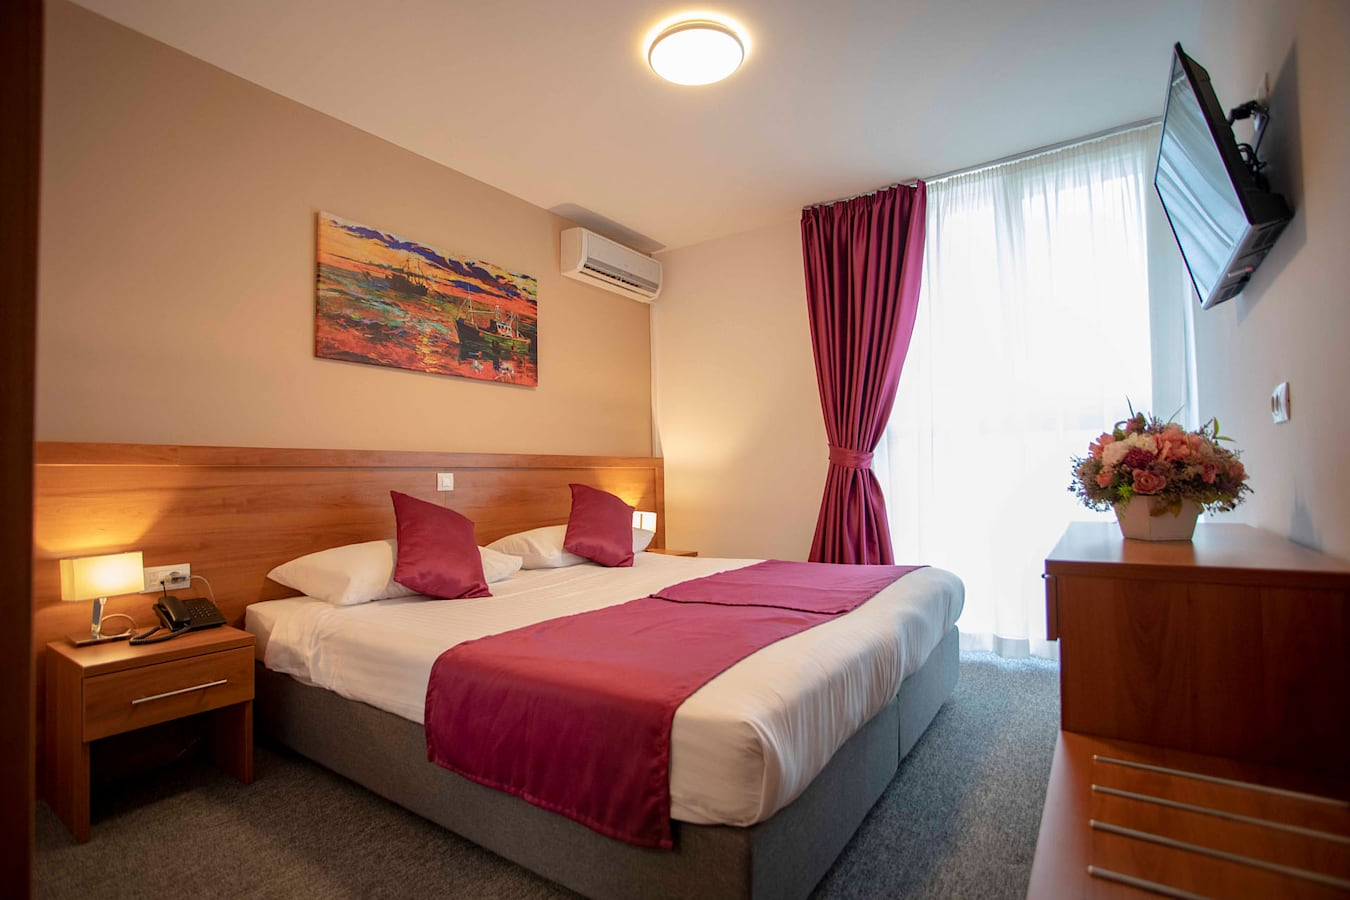 hotel_komodor_double_room.jpg